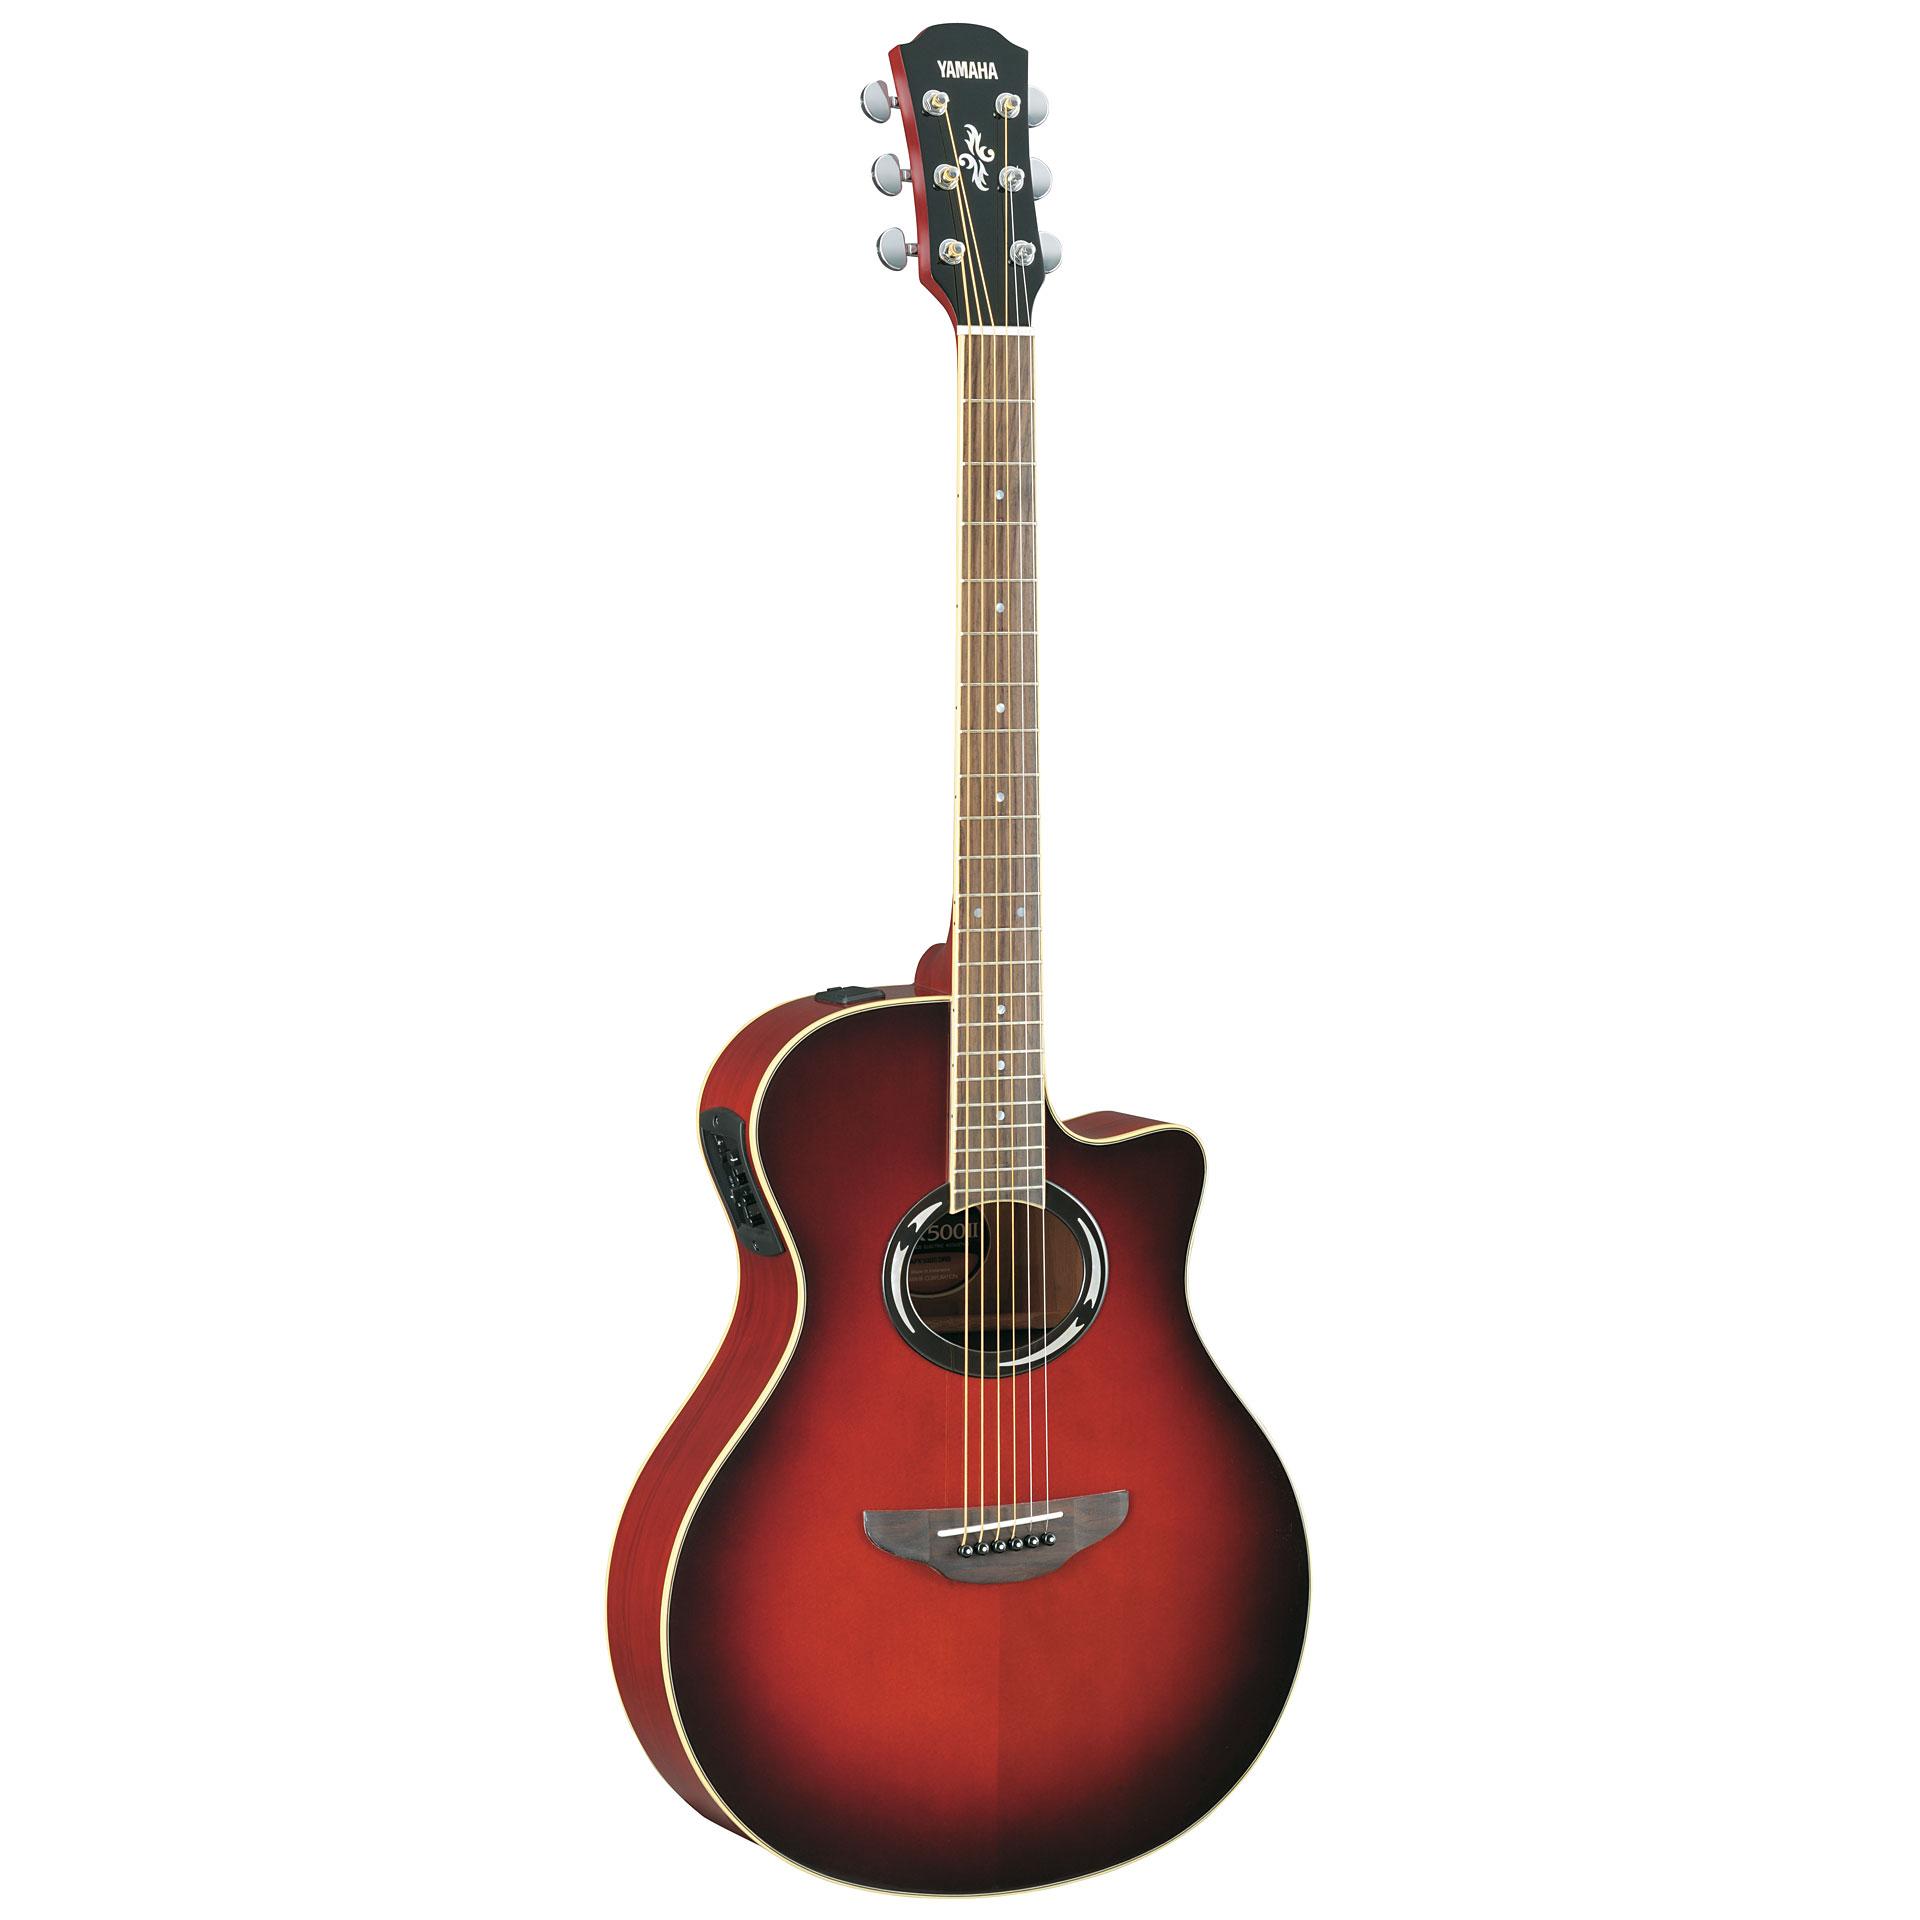 Yamaha apx500iii dsr acoustic guitar for Apx guitar yamaha